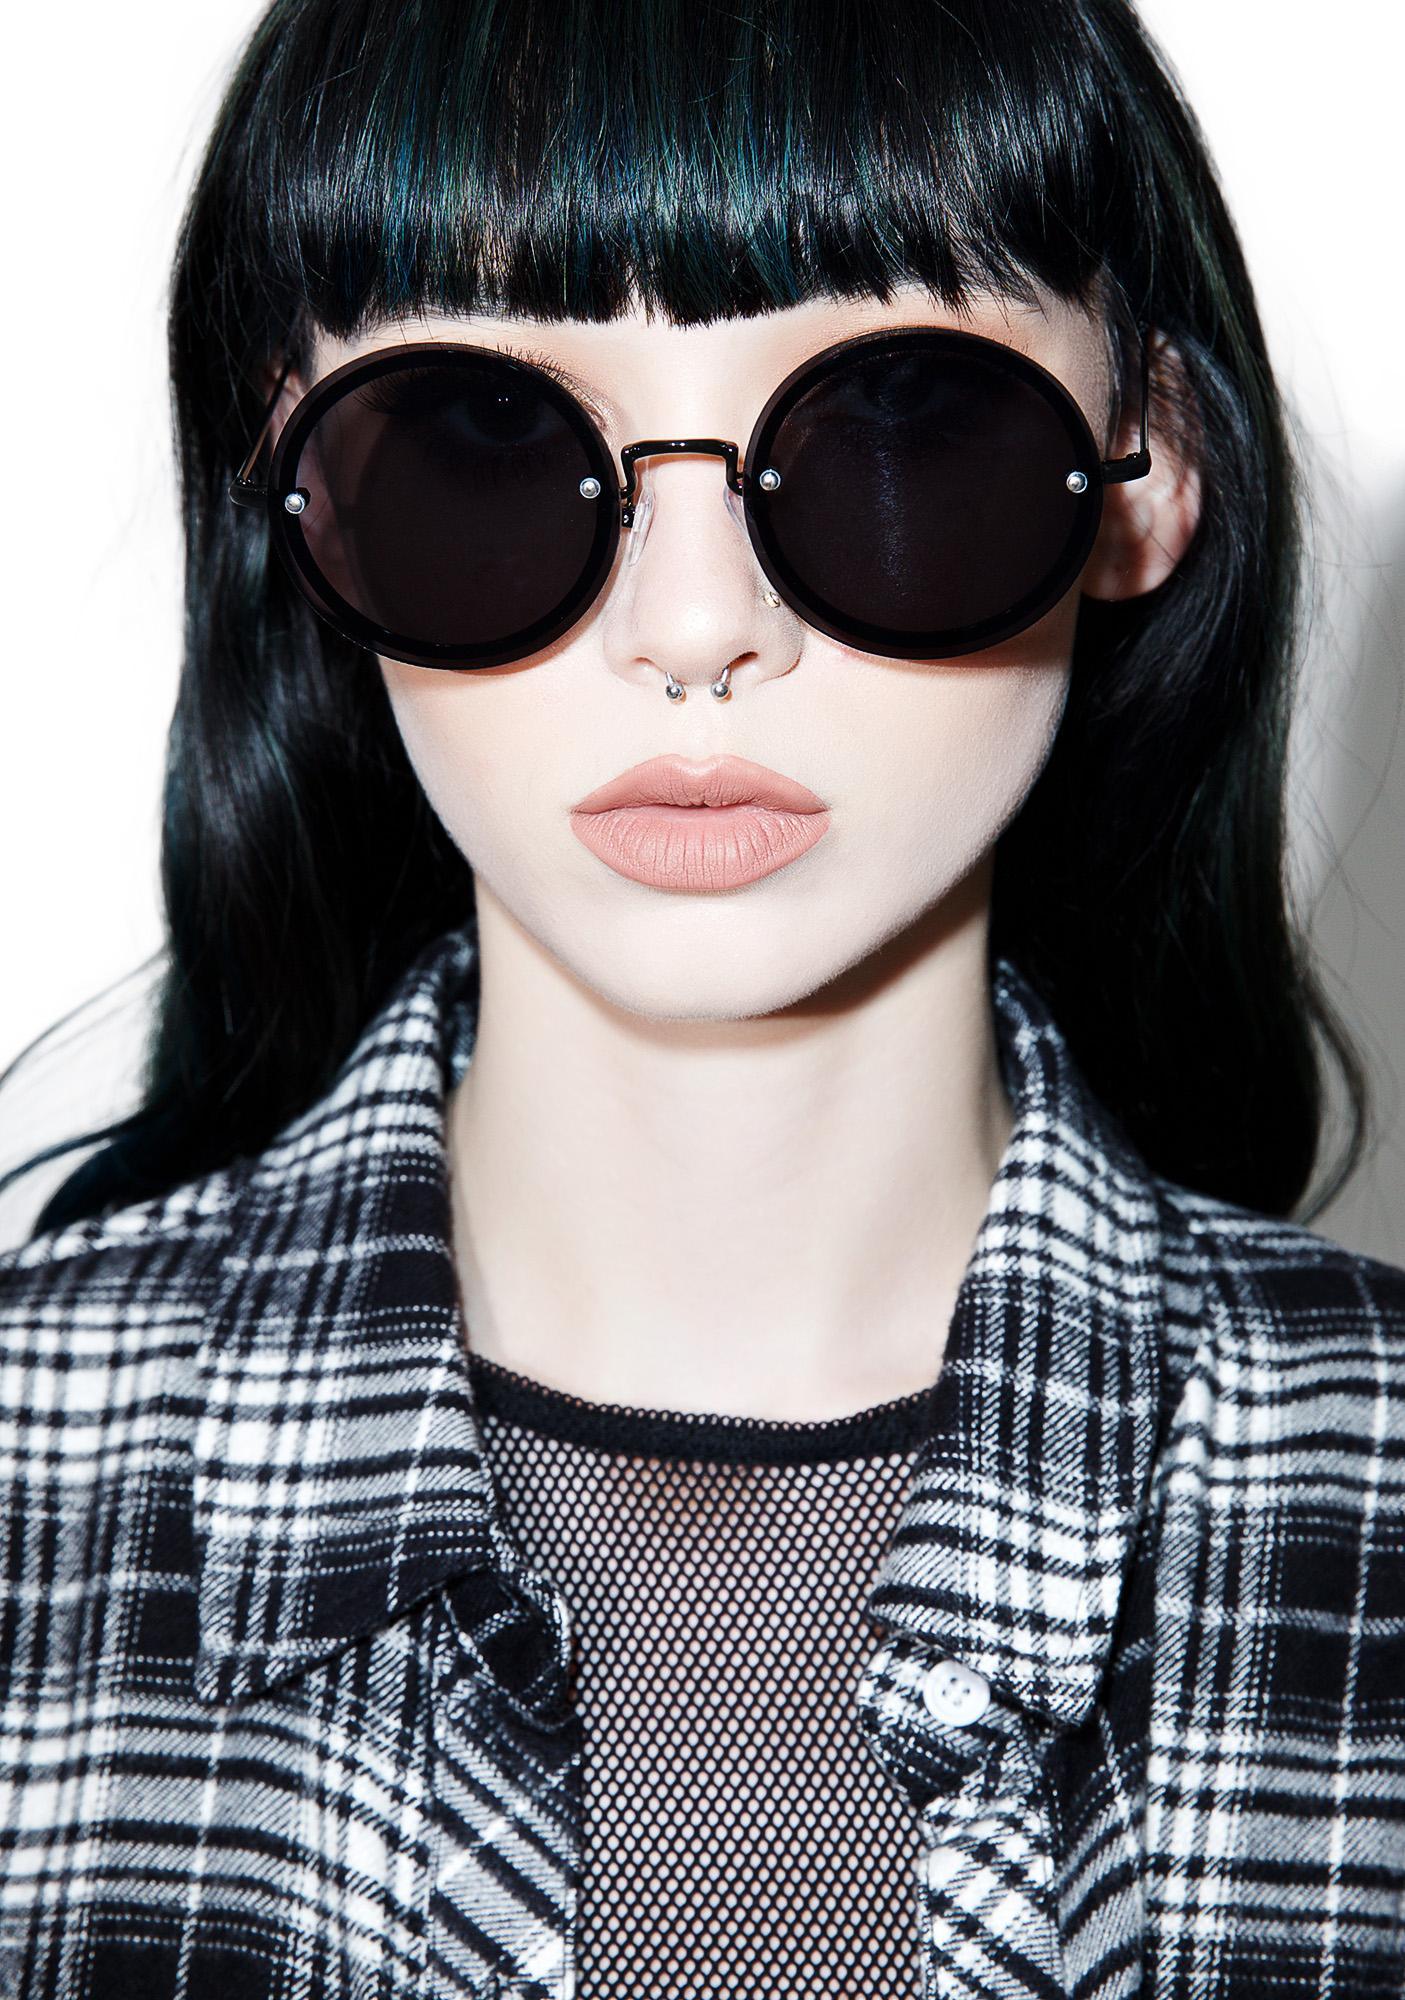 Daria Circle Sunglasses